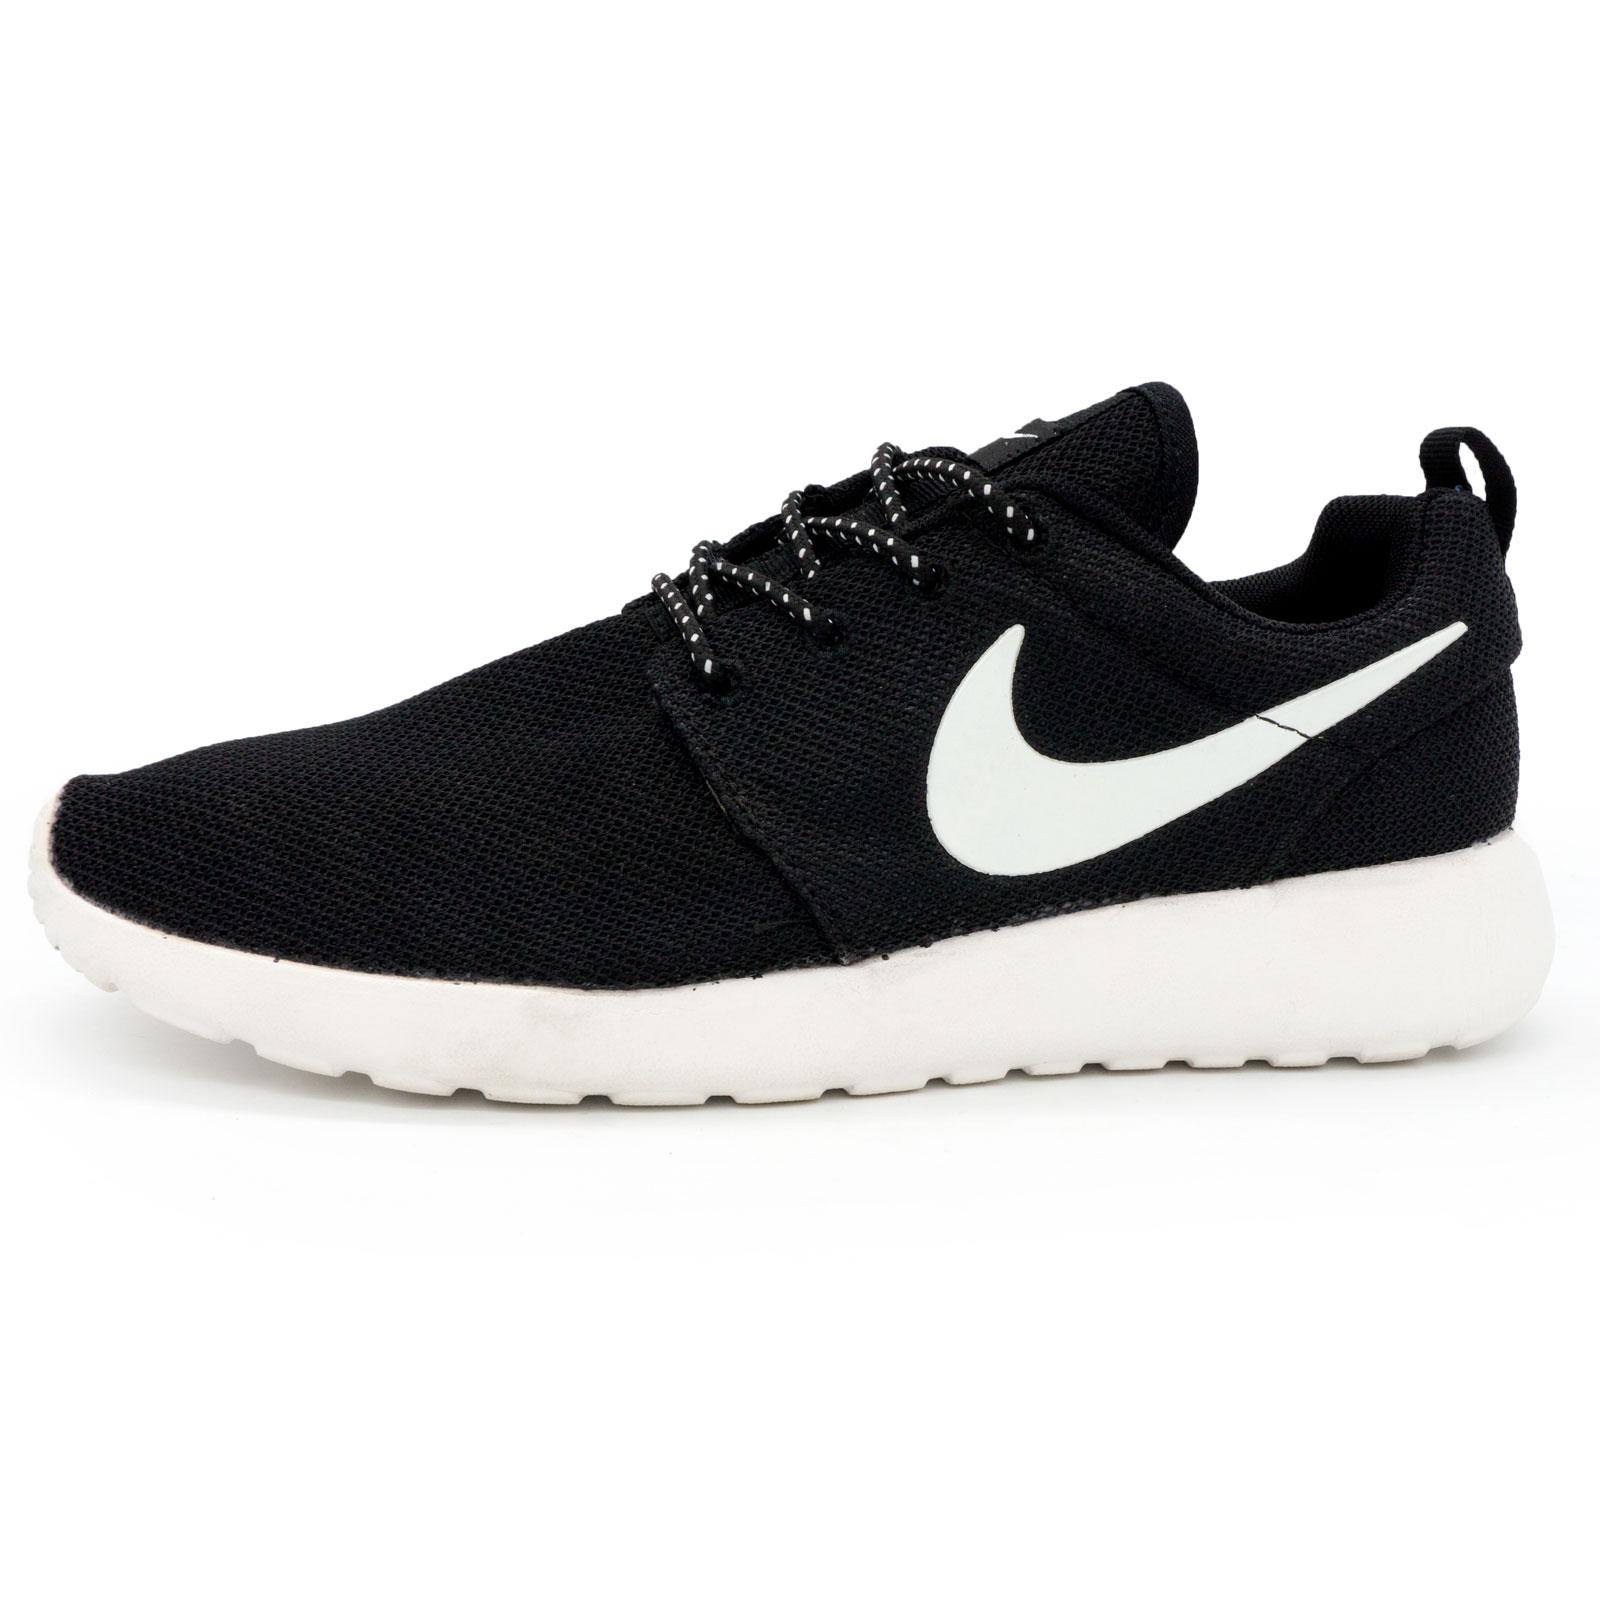 фото main Nike Roshe Run Vietnam черно белые main